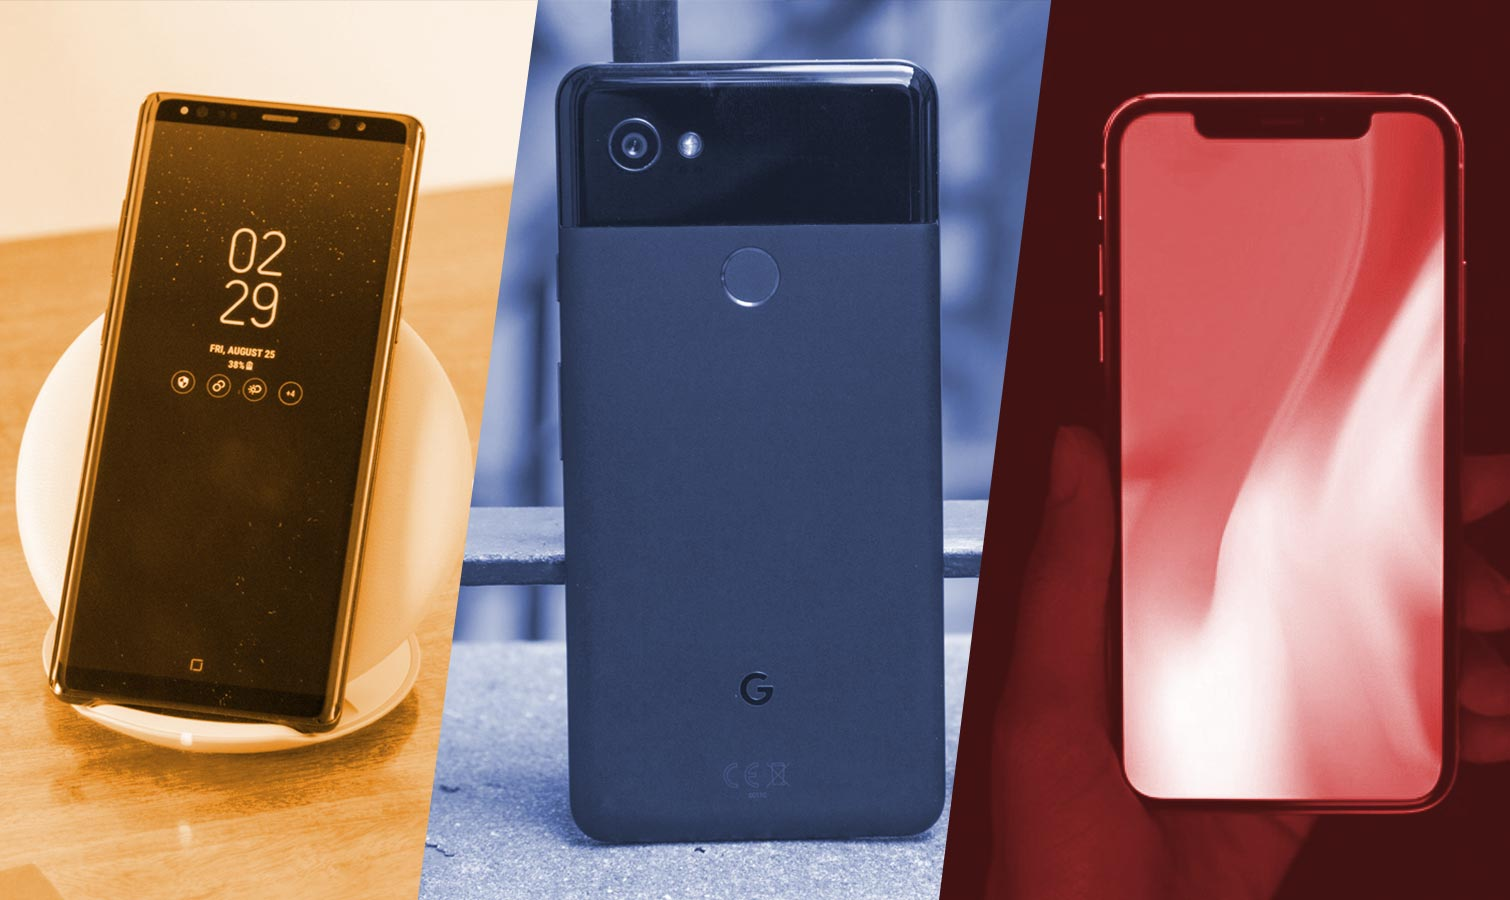 Iphone X Note 8 Pixel 2 Galaxy S8 Lg V30 Duvar